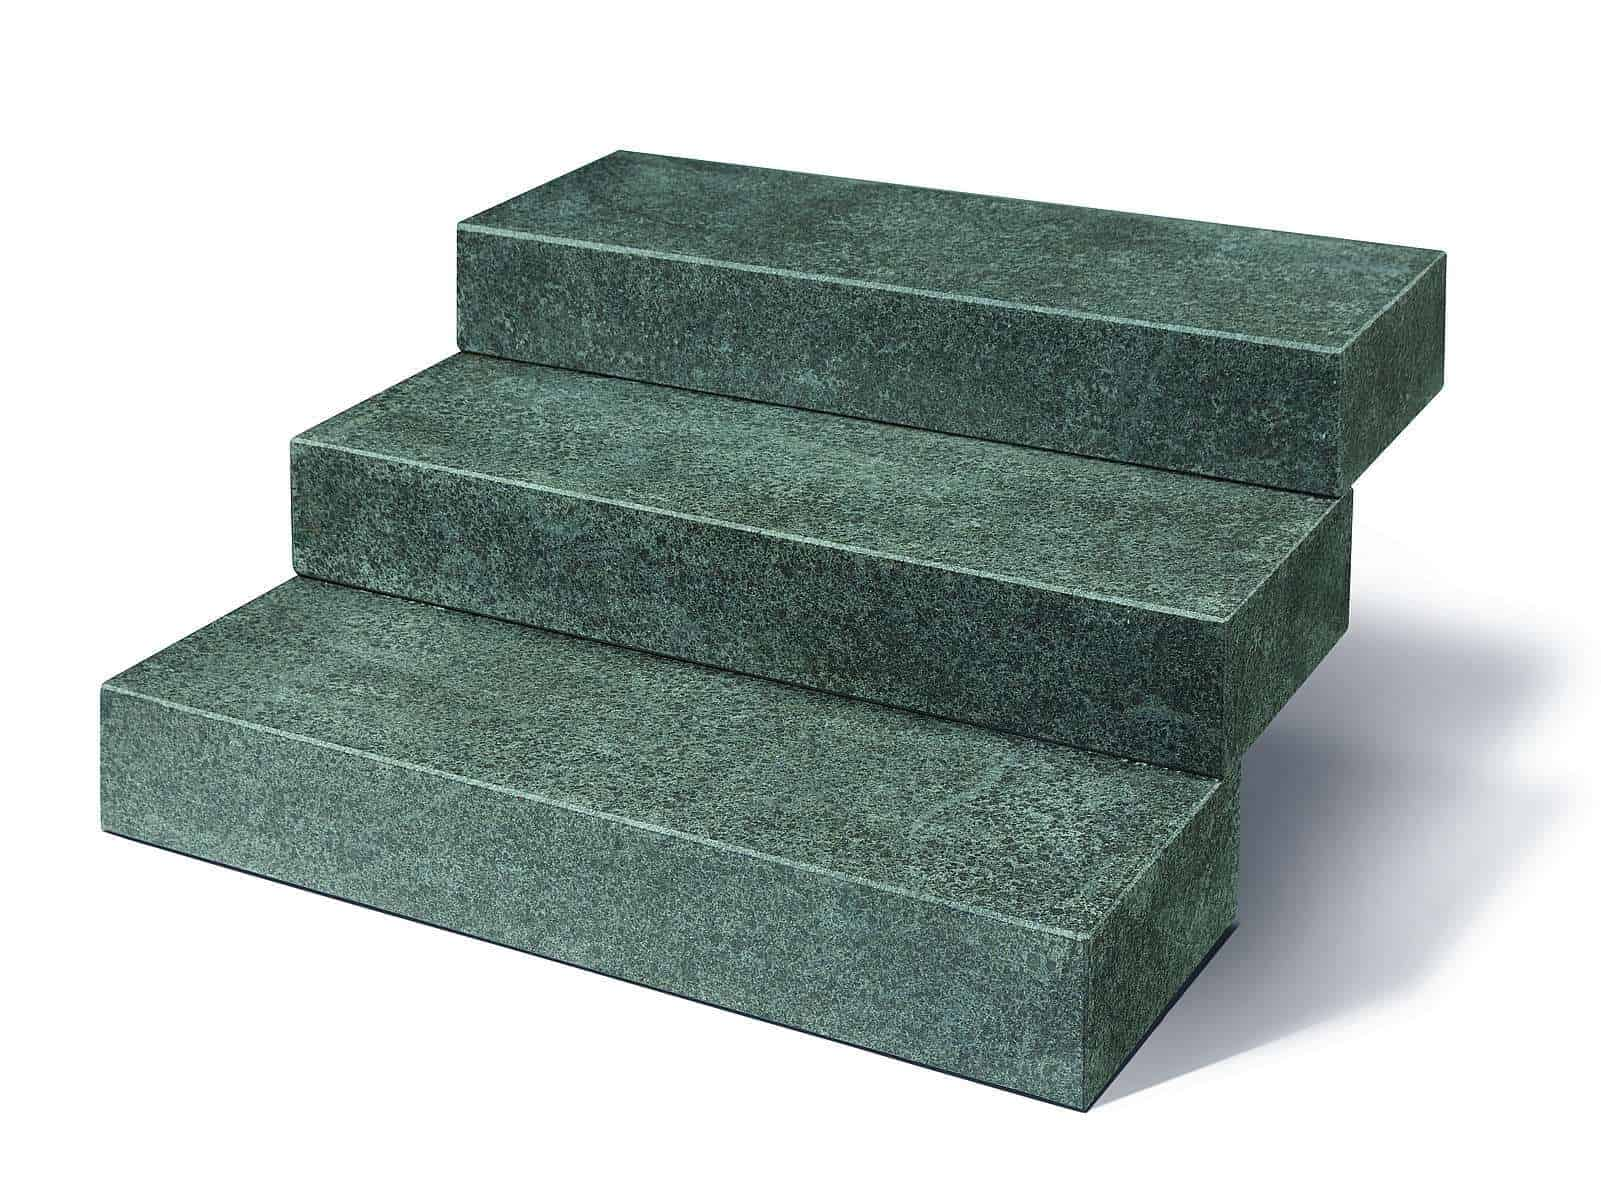 Blockstufe Basalt Kristall schwarz